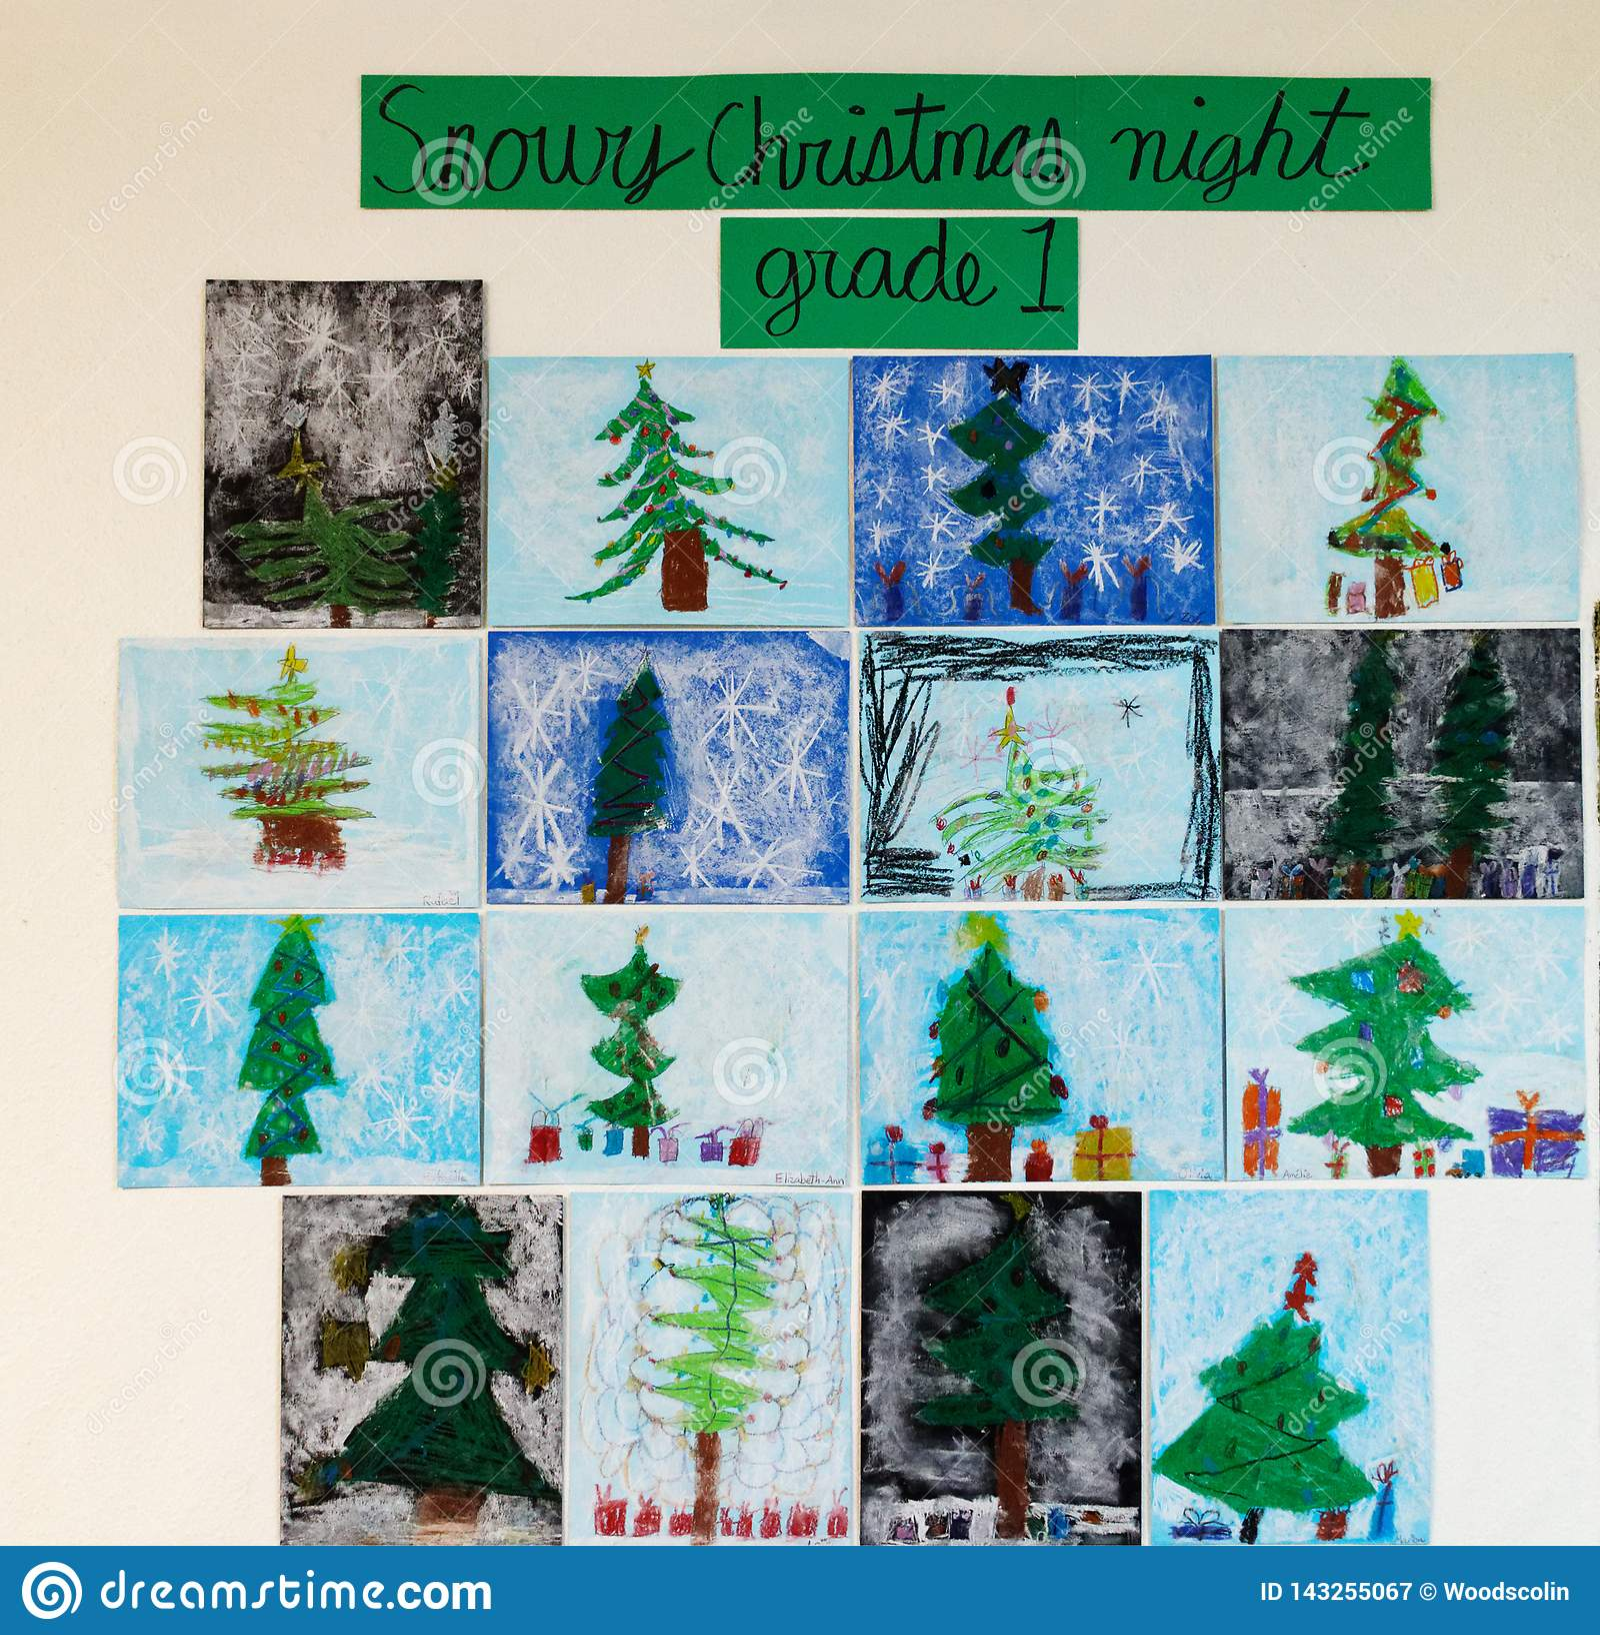 Childrens art - Snowy Christmas Night